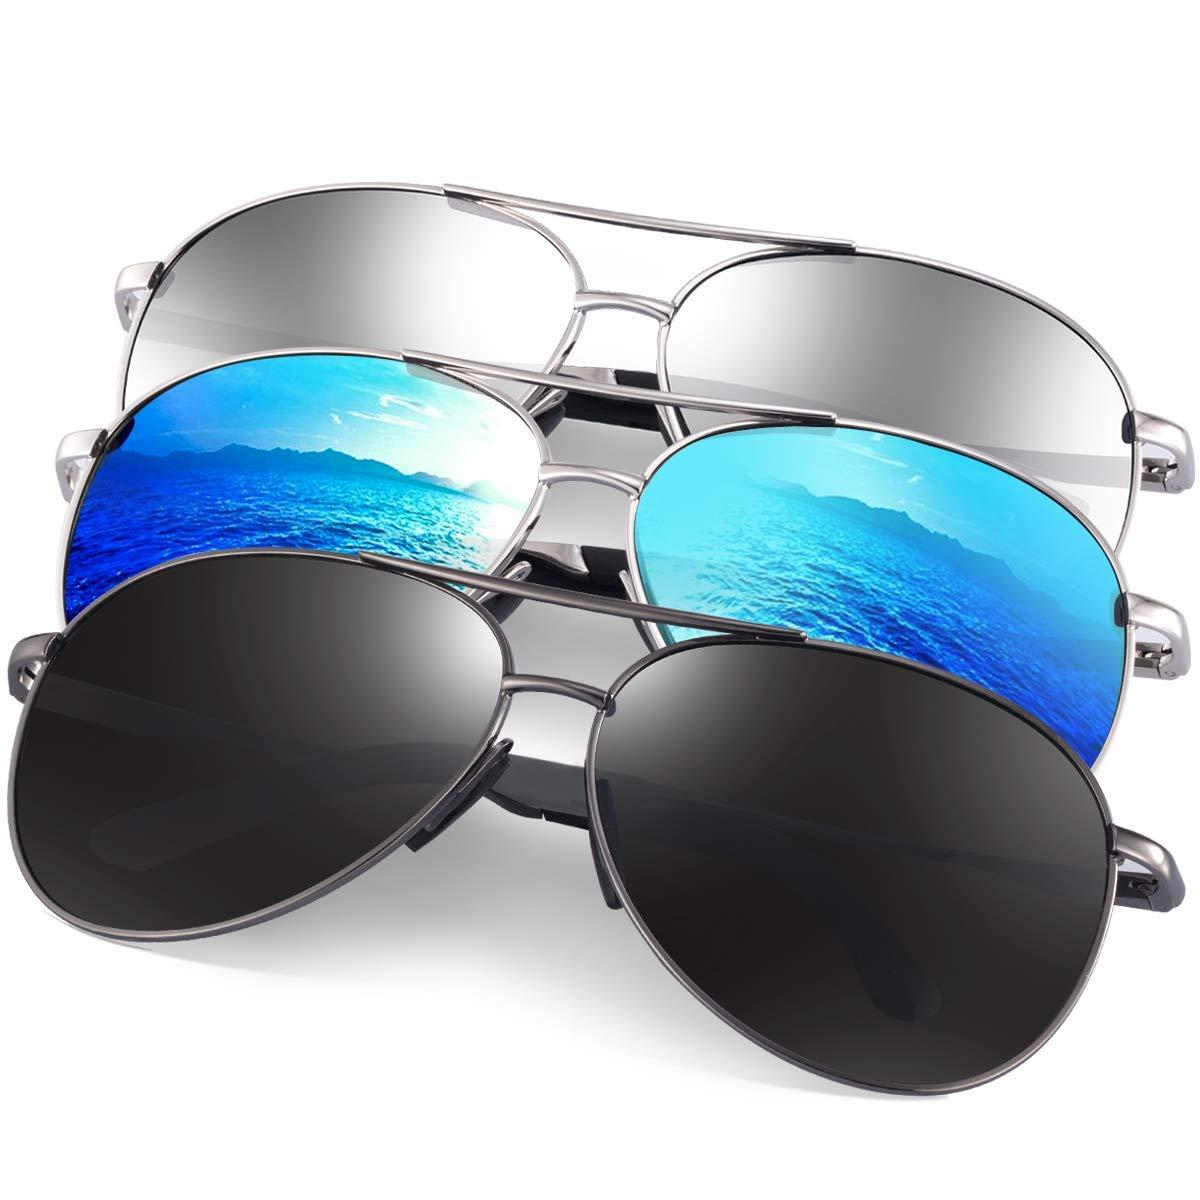 Polarized Aviator Sunglasses for Men - Feirdio Metal Frame Sports UV 400 Protection Mens Women Sunglasses 2261 (3pack(blue+black+silver), 2.36) by Feirdio